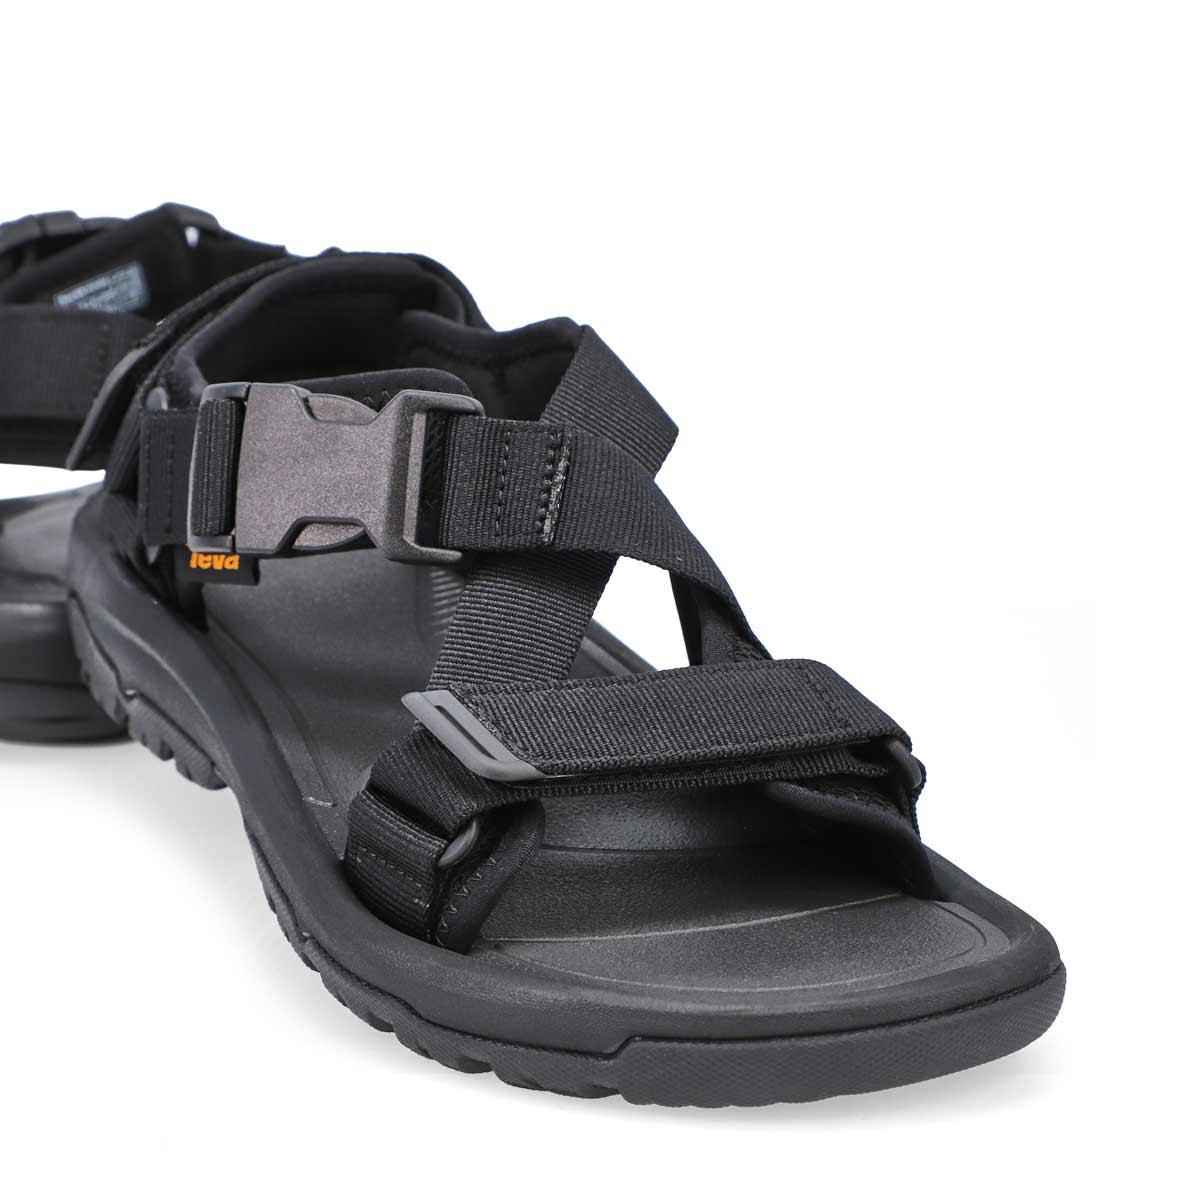 Sandale sport Hurricane Verge noires hommes